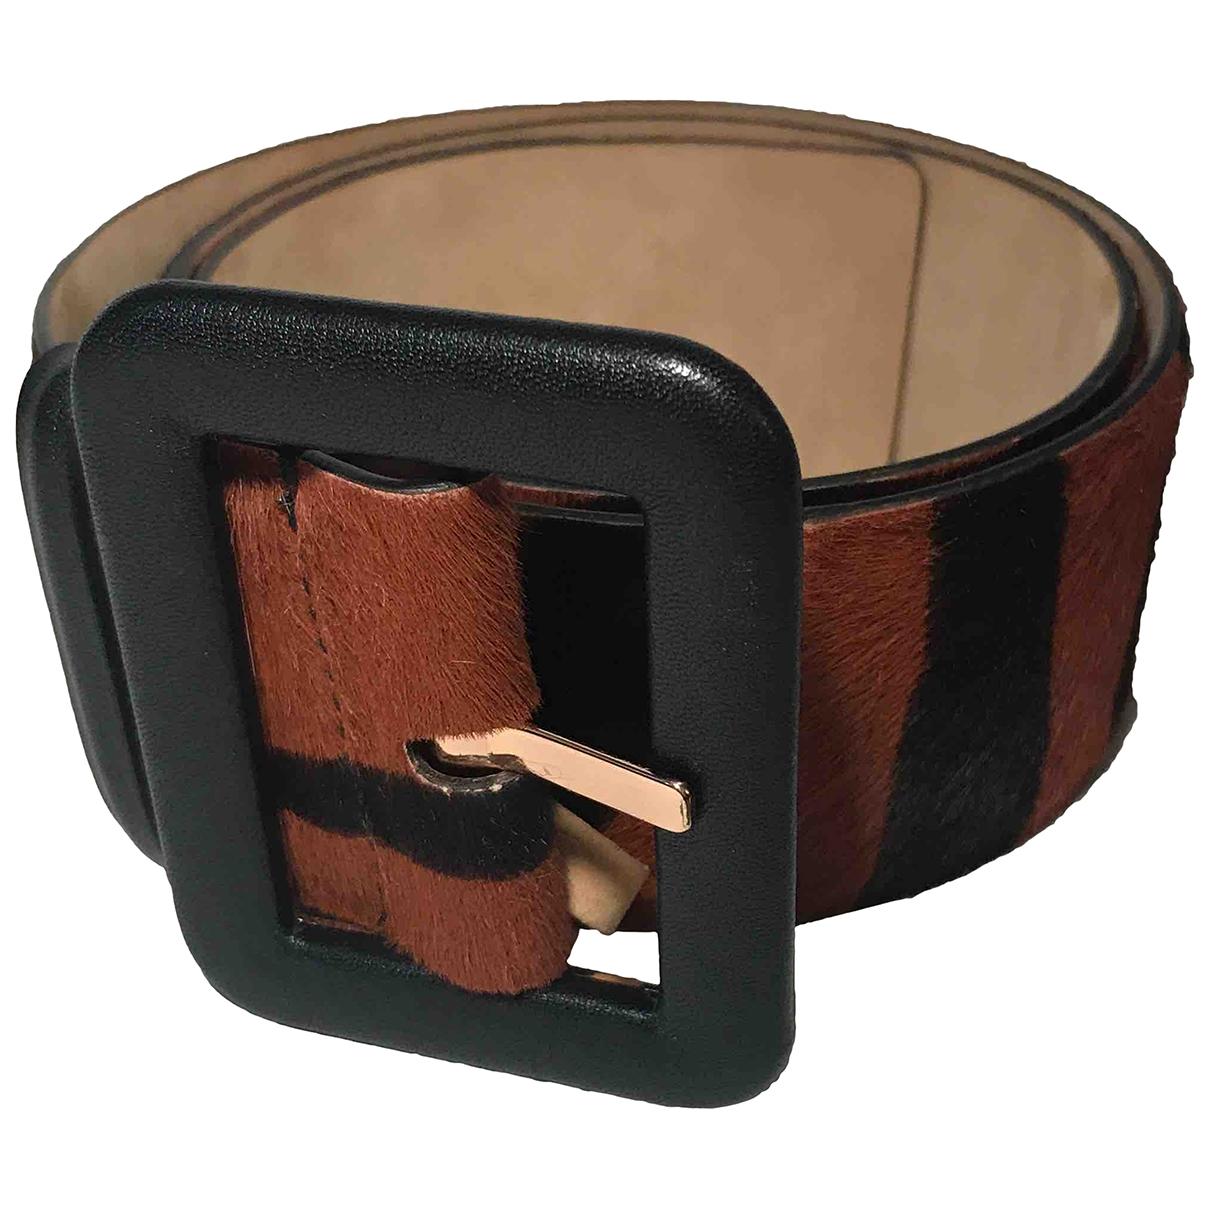 Roberto Cavalli \N Brown Leather belt for Women 70 cm